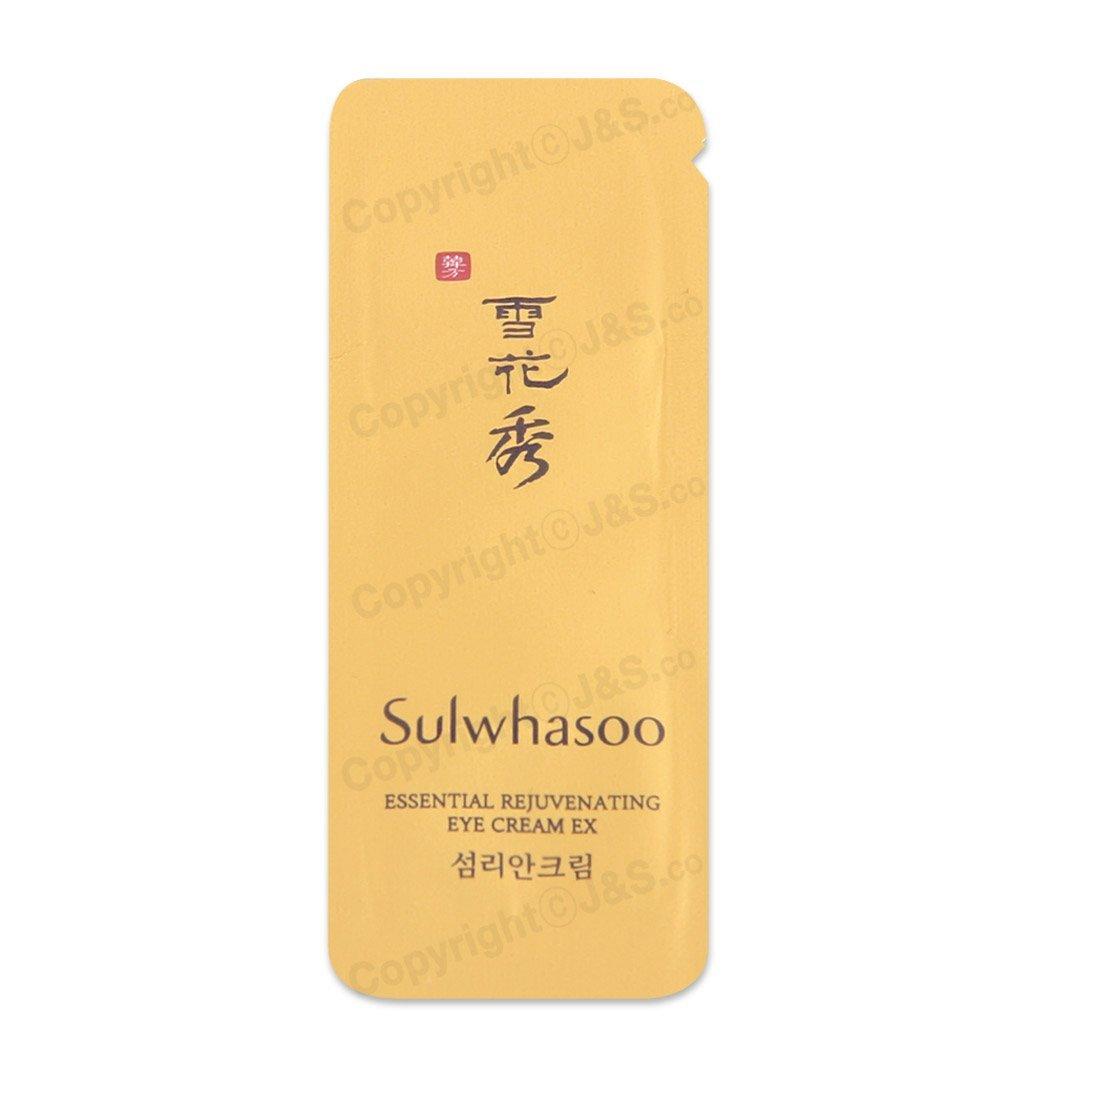 30pcs X Sulwhasoo NEW Essential Rejuvenating Eye Cream EX 1ml